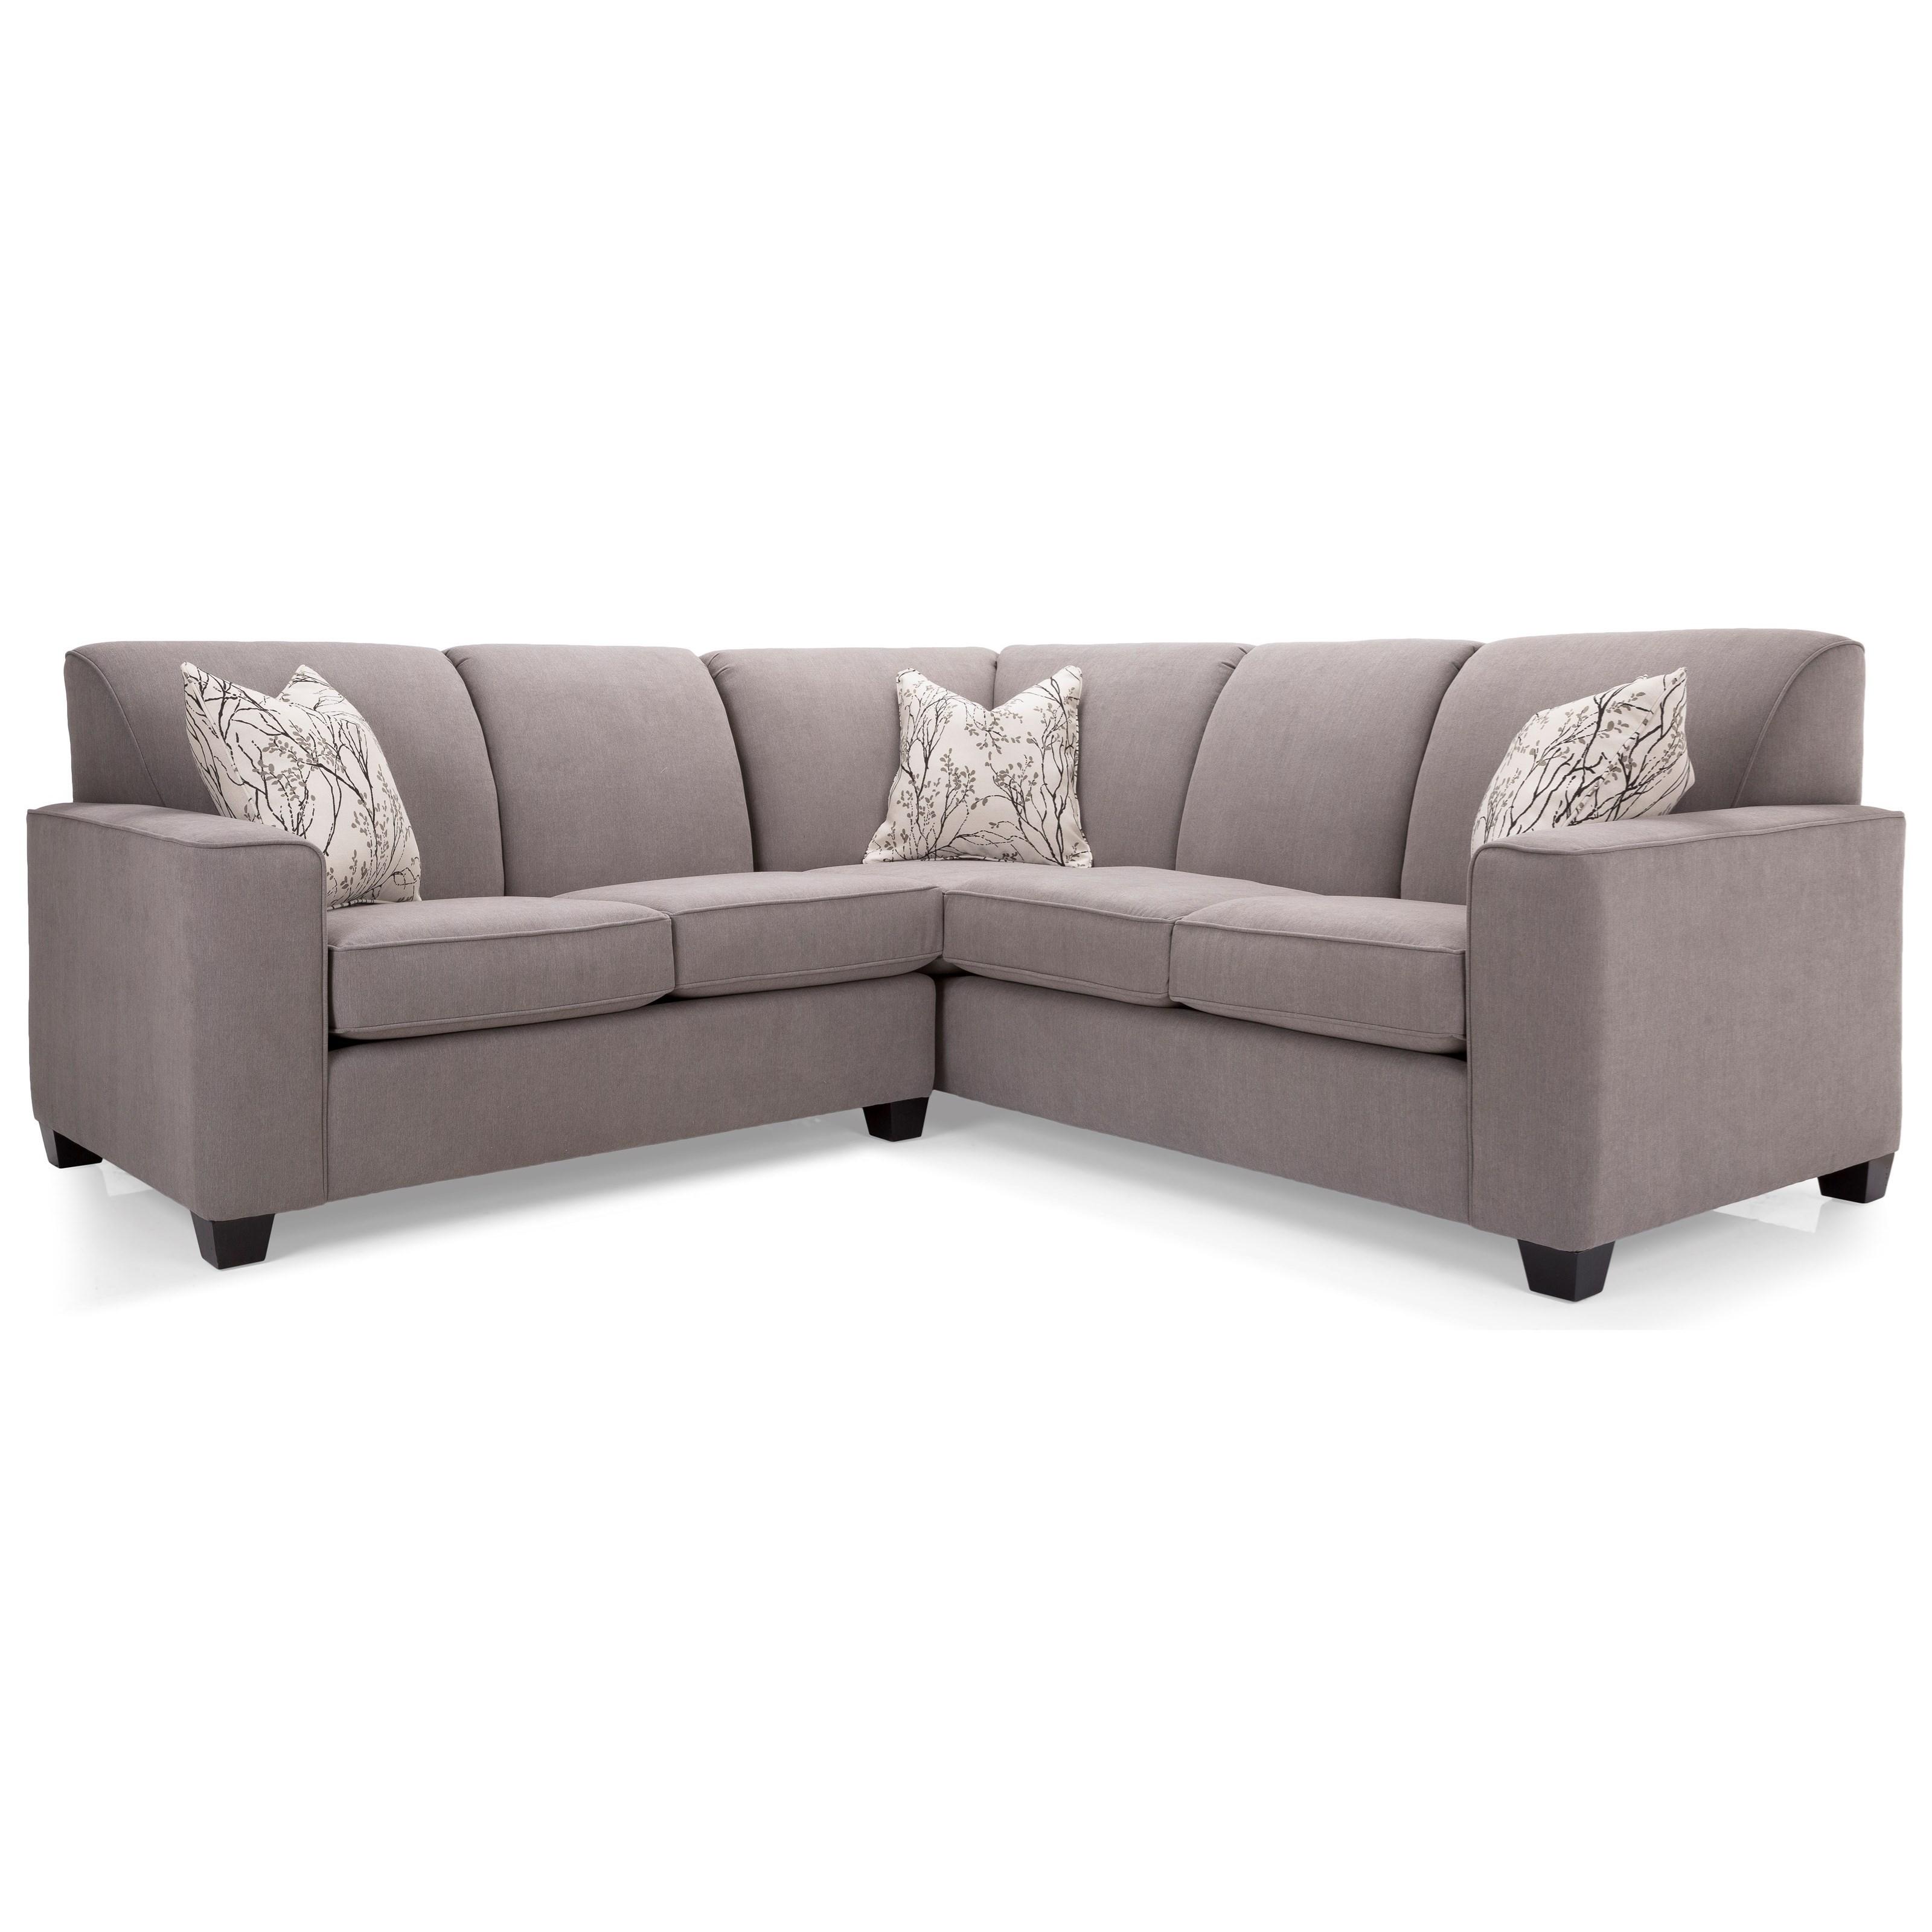 Decor Rest 2705 L Shaped Sectional Sofa